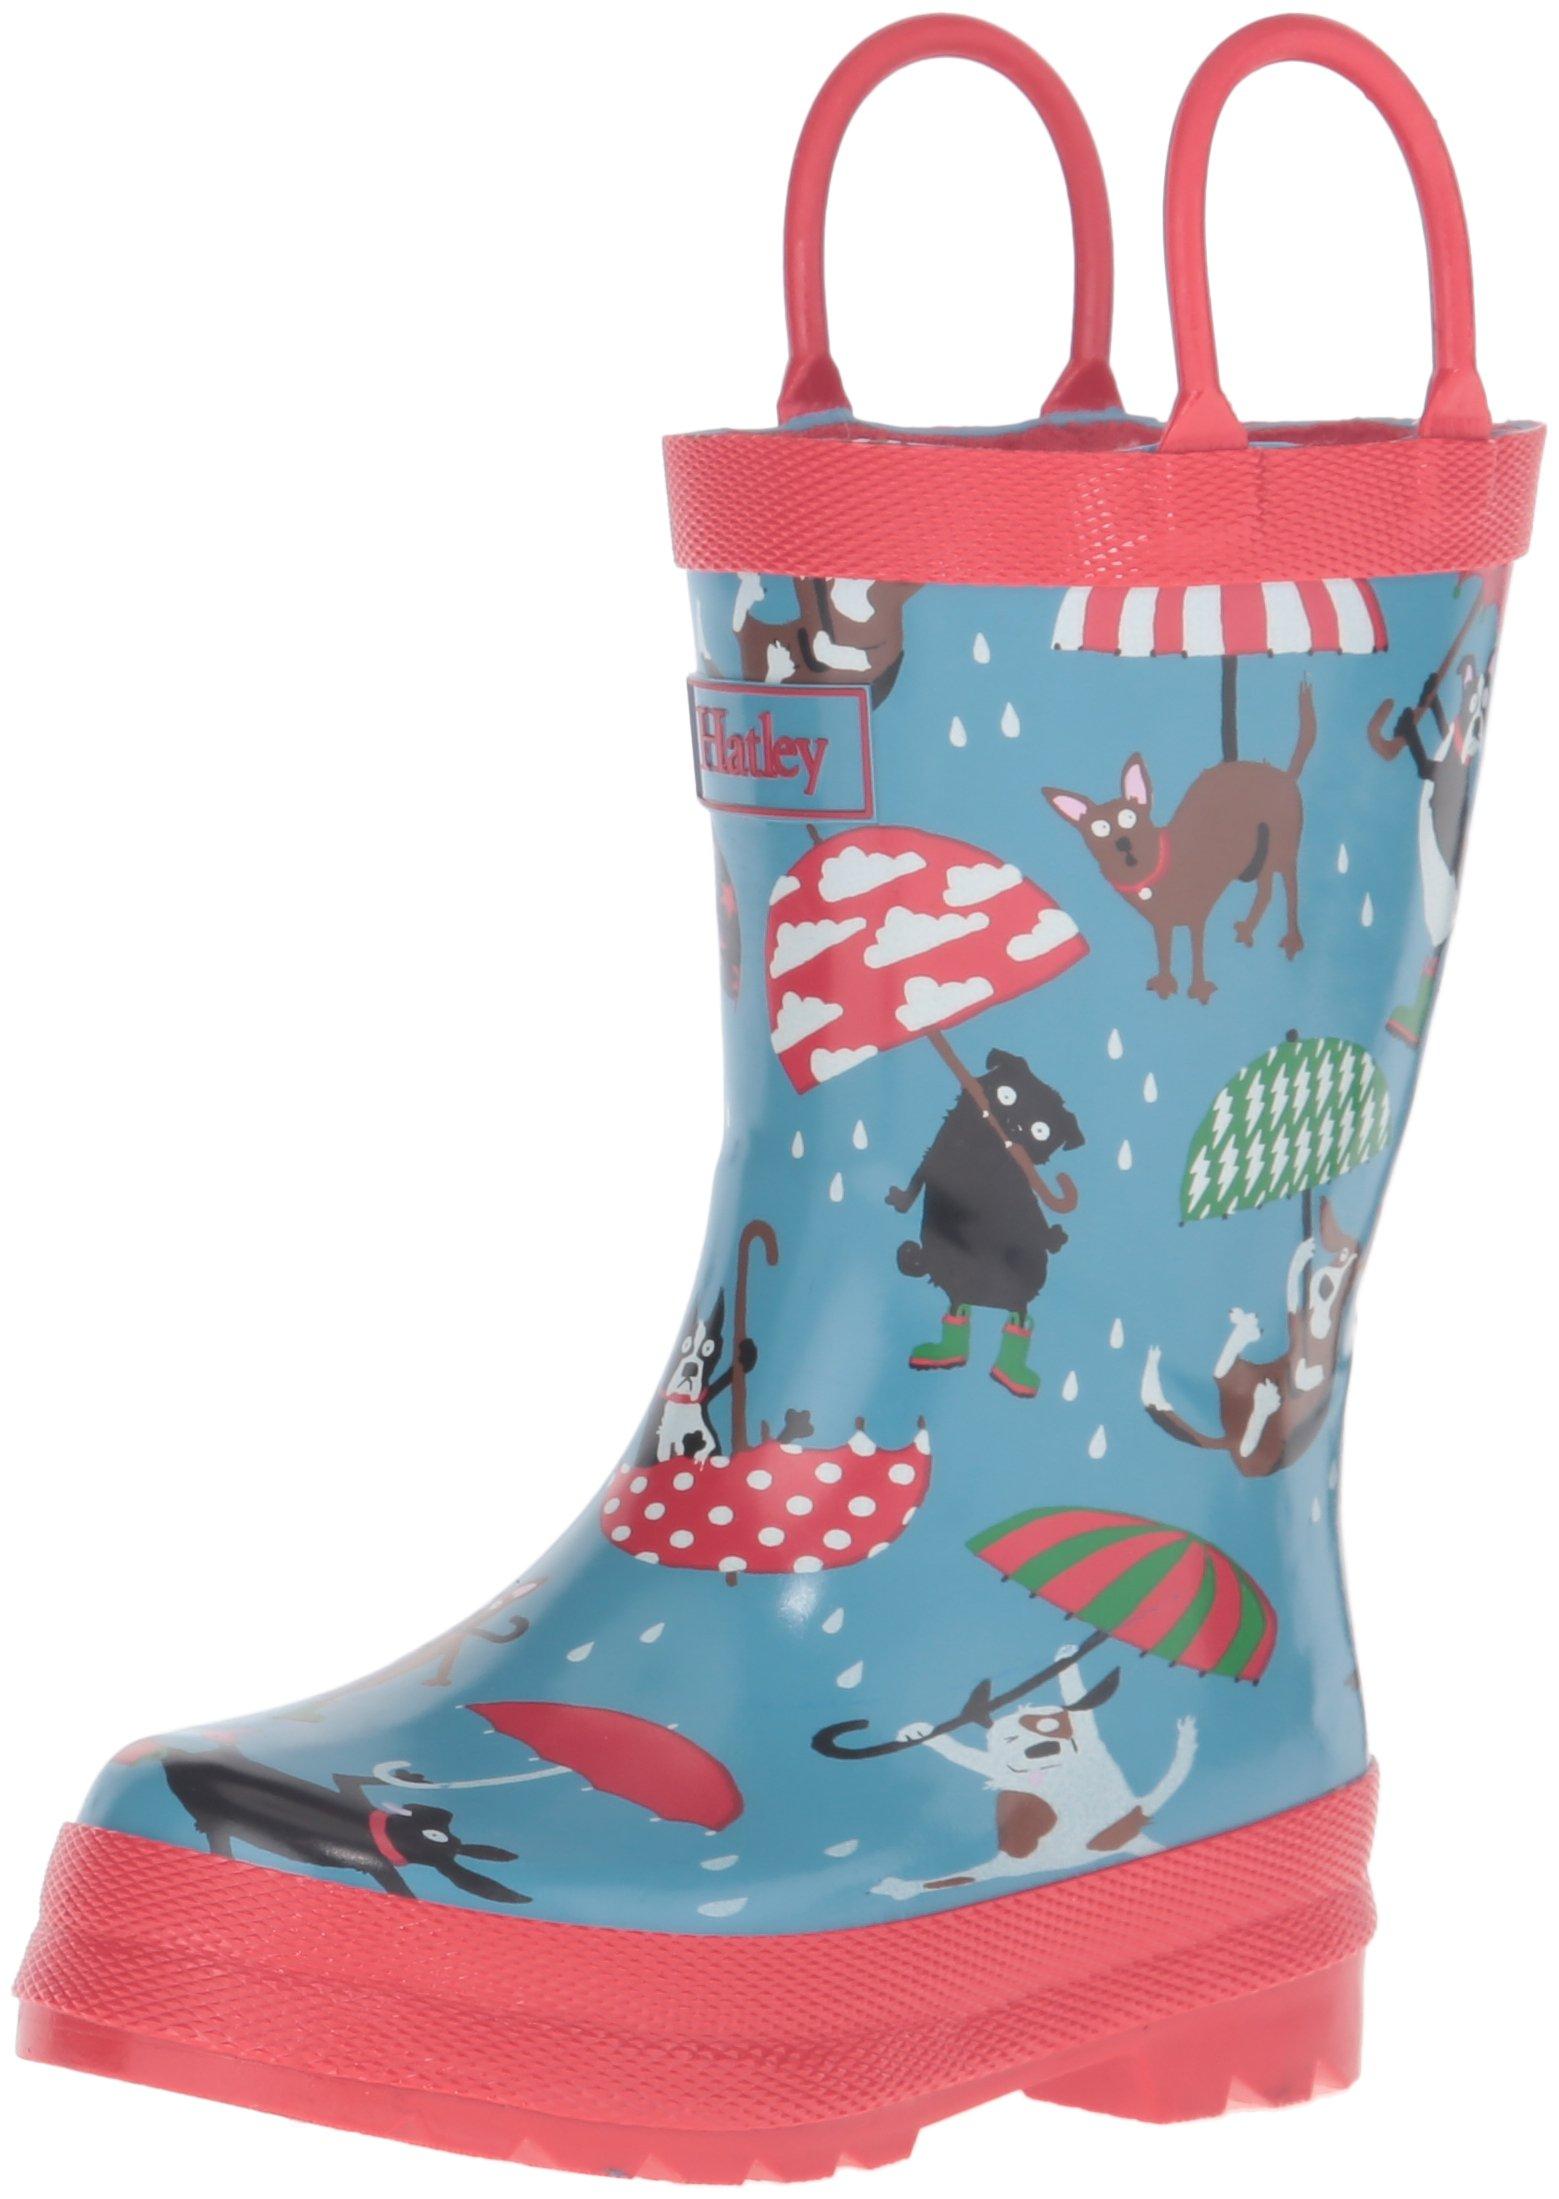 Hatley Boys' Printed Boots Rain Accessory, Raining Dogs, 9 M US Little Kid